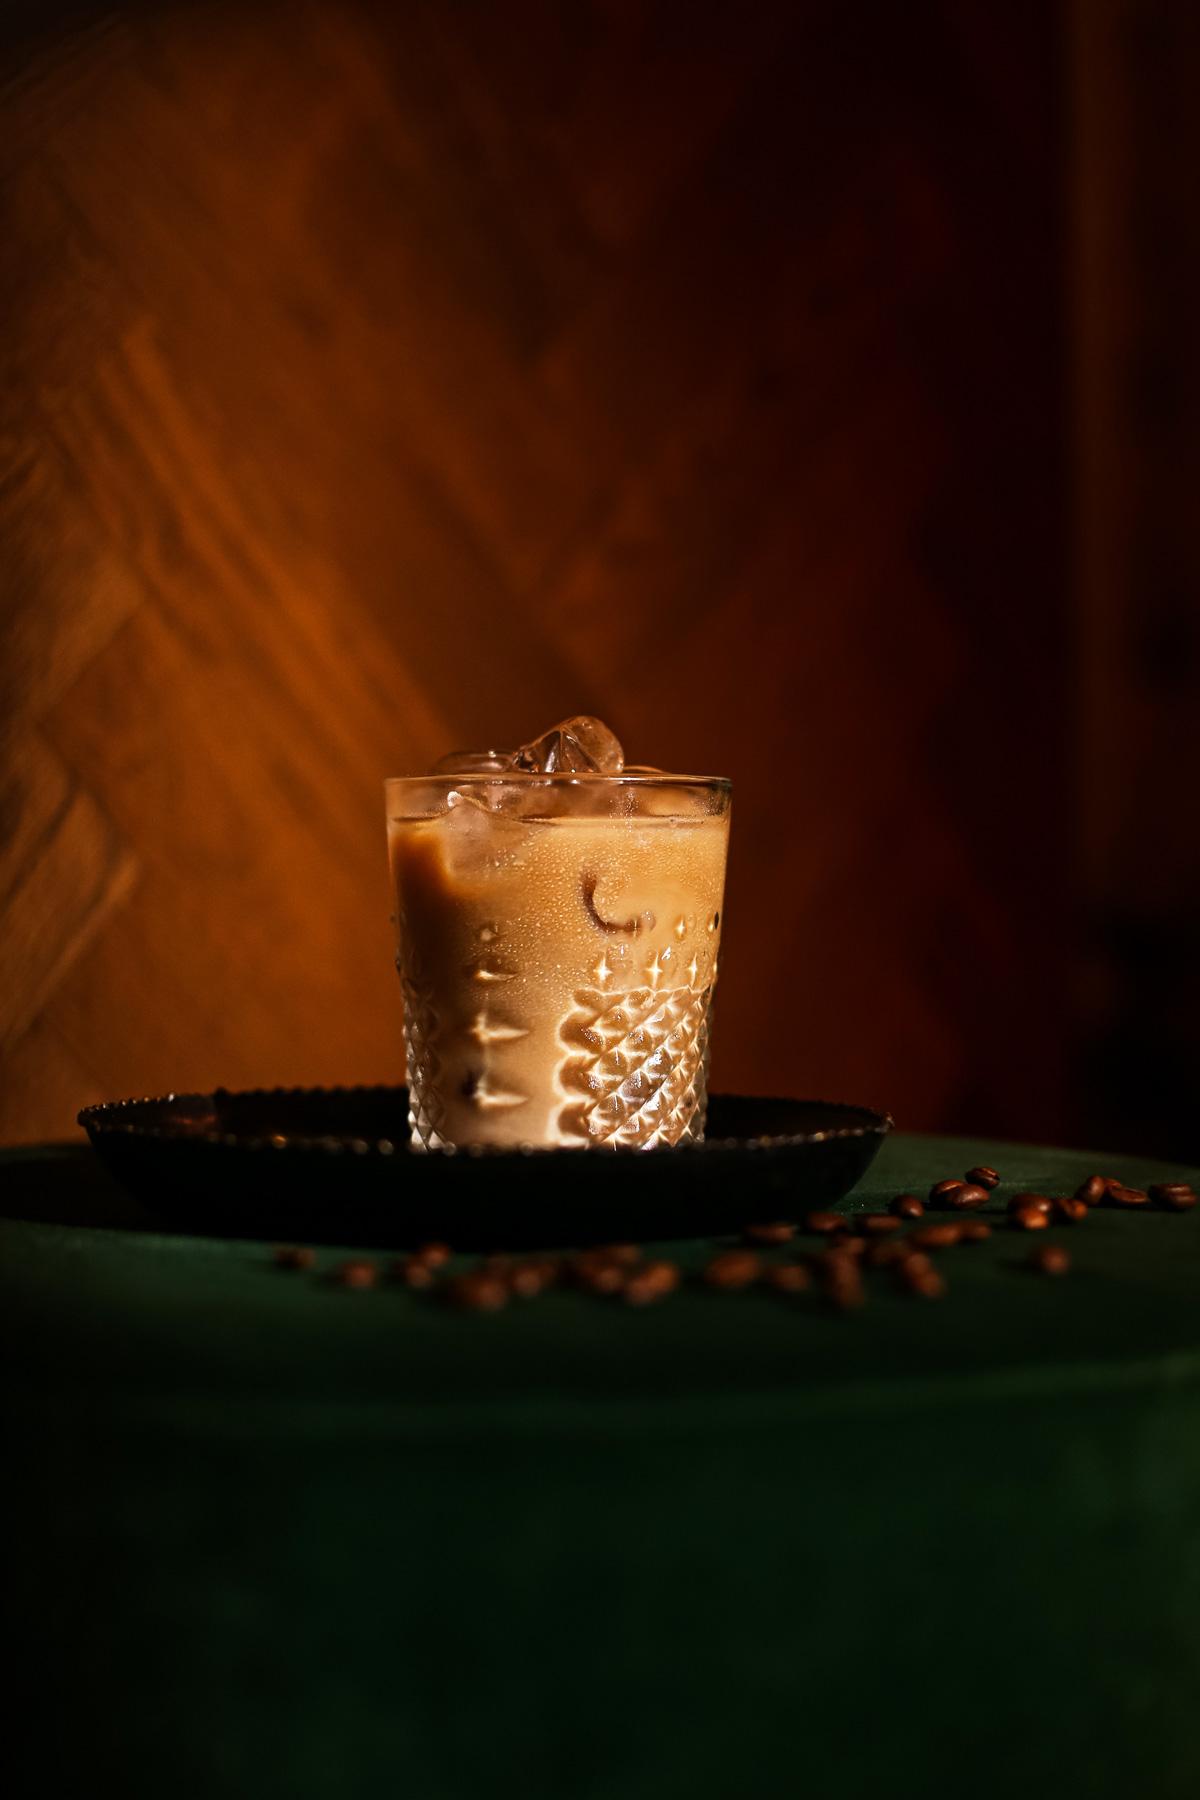 licor43-cocktail-photoshoot-studiovolt-1